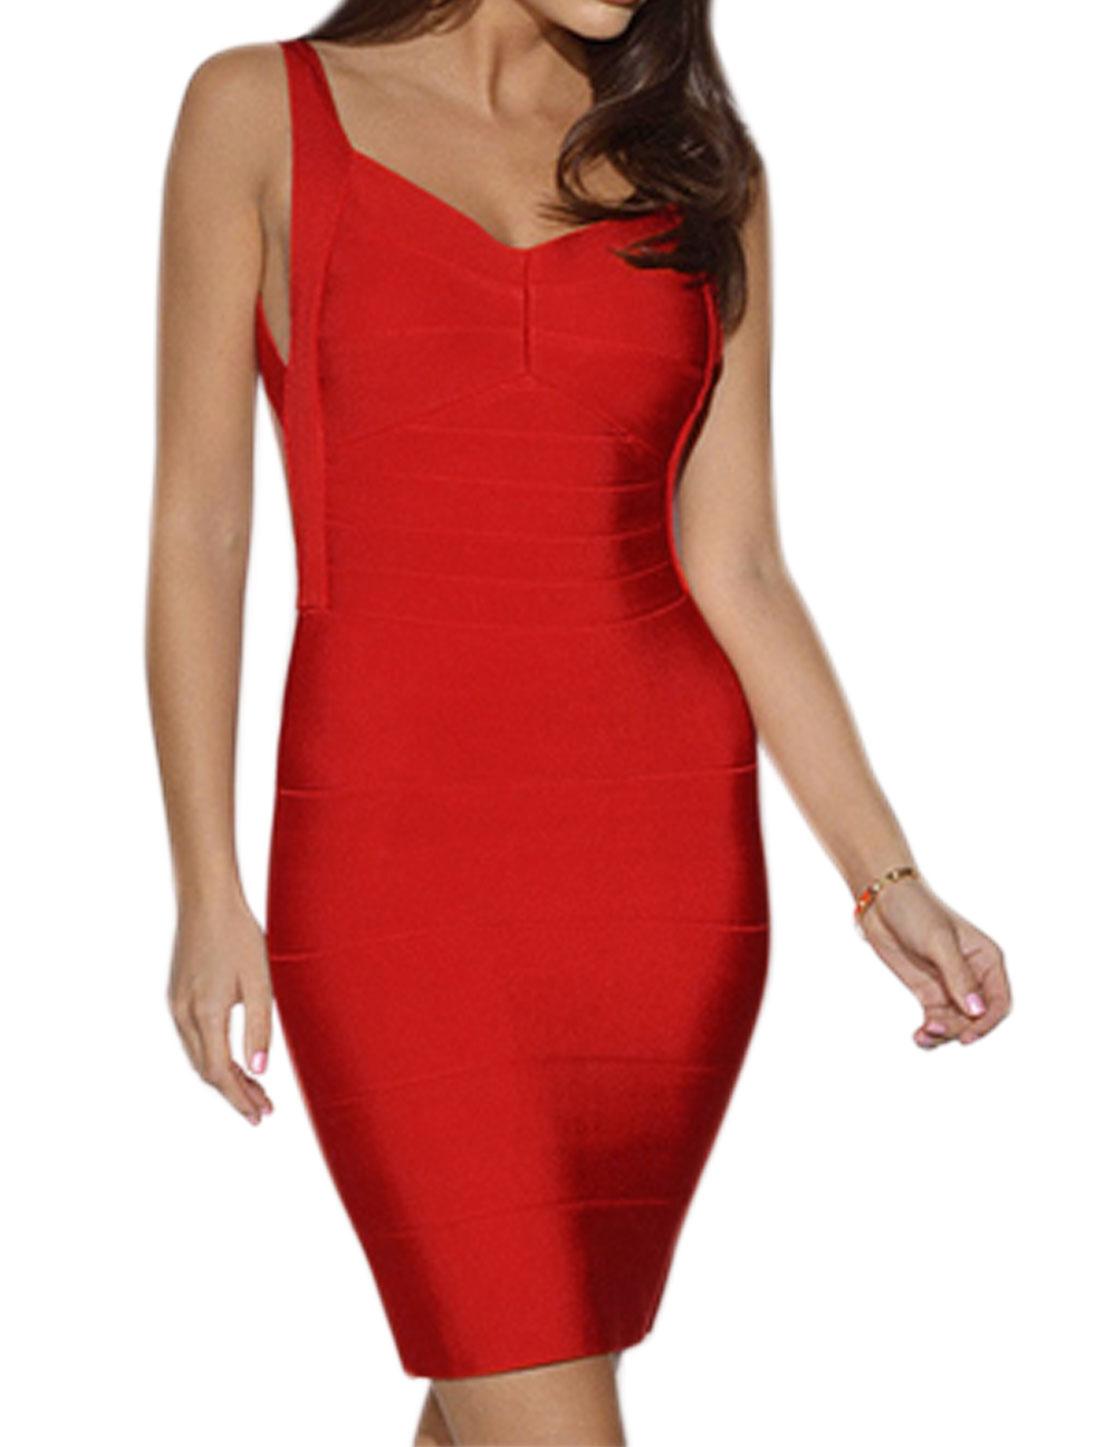 Women Asymmetric Neck Straps Backless Bodycon Dress Red S